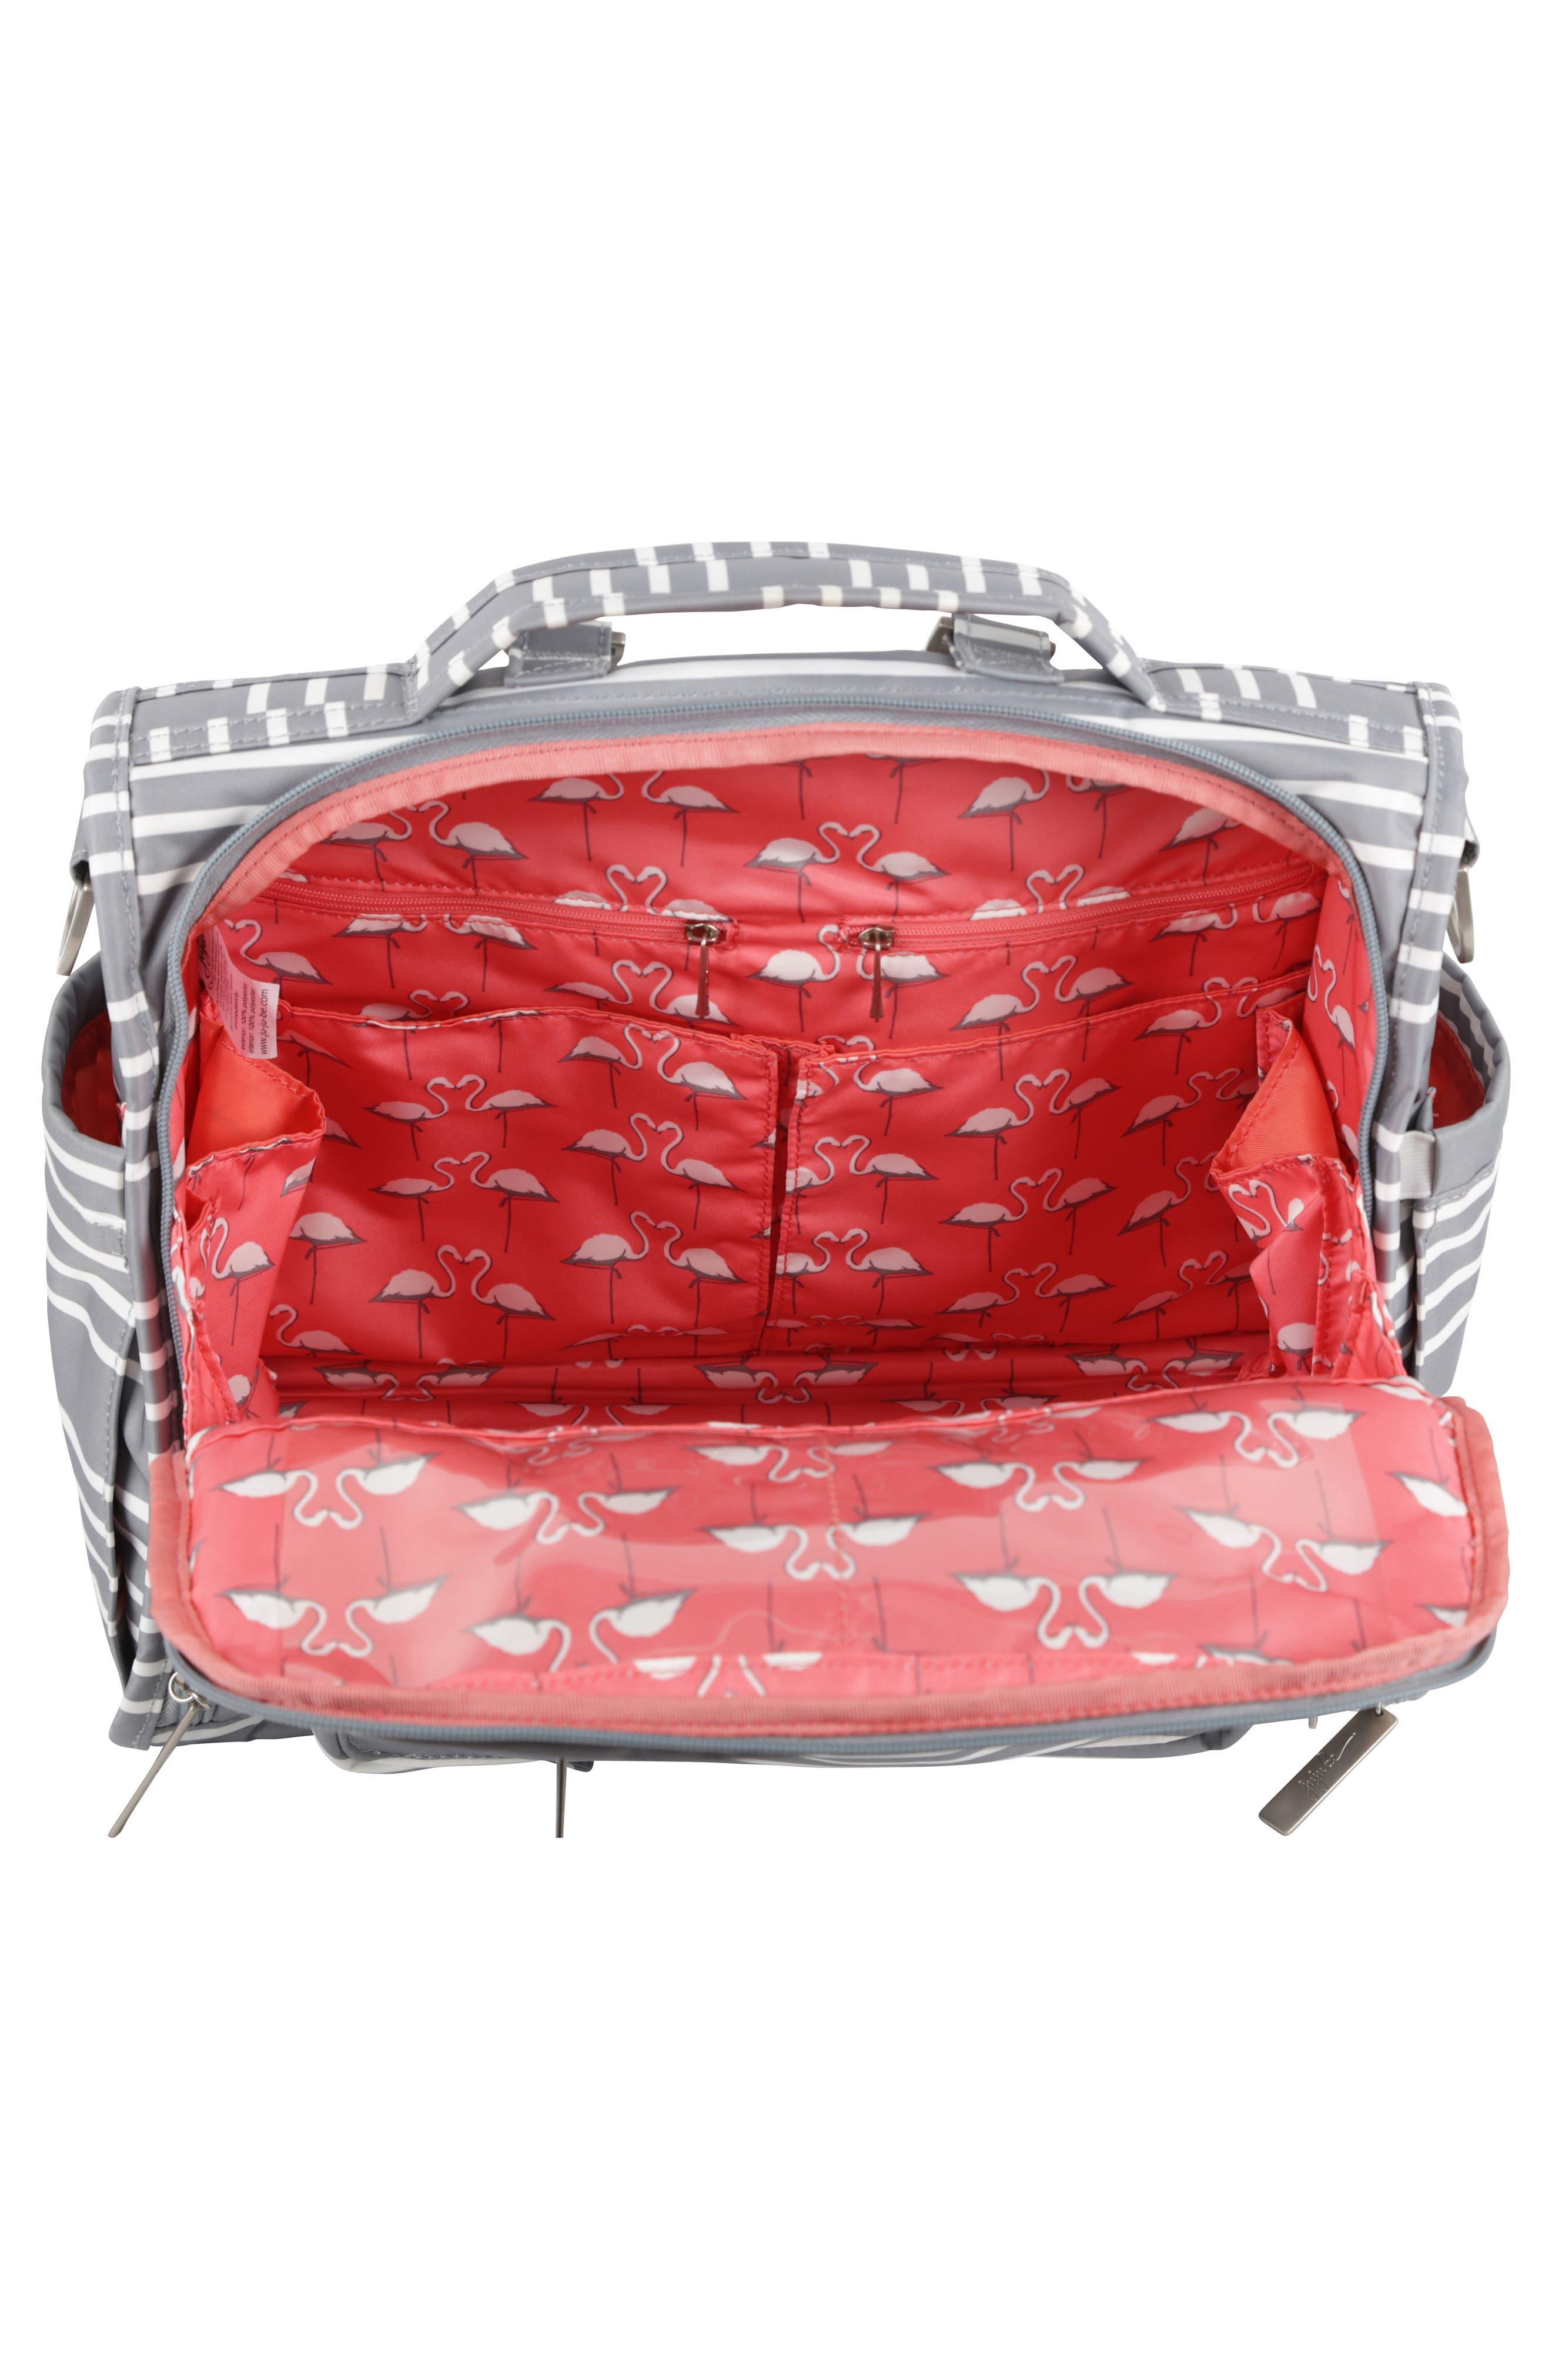 BFF - Coastal Collection Diaper Bag,                             Alternate thumbnail 3, color,                             042